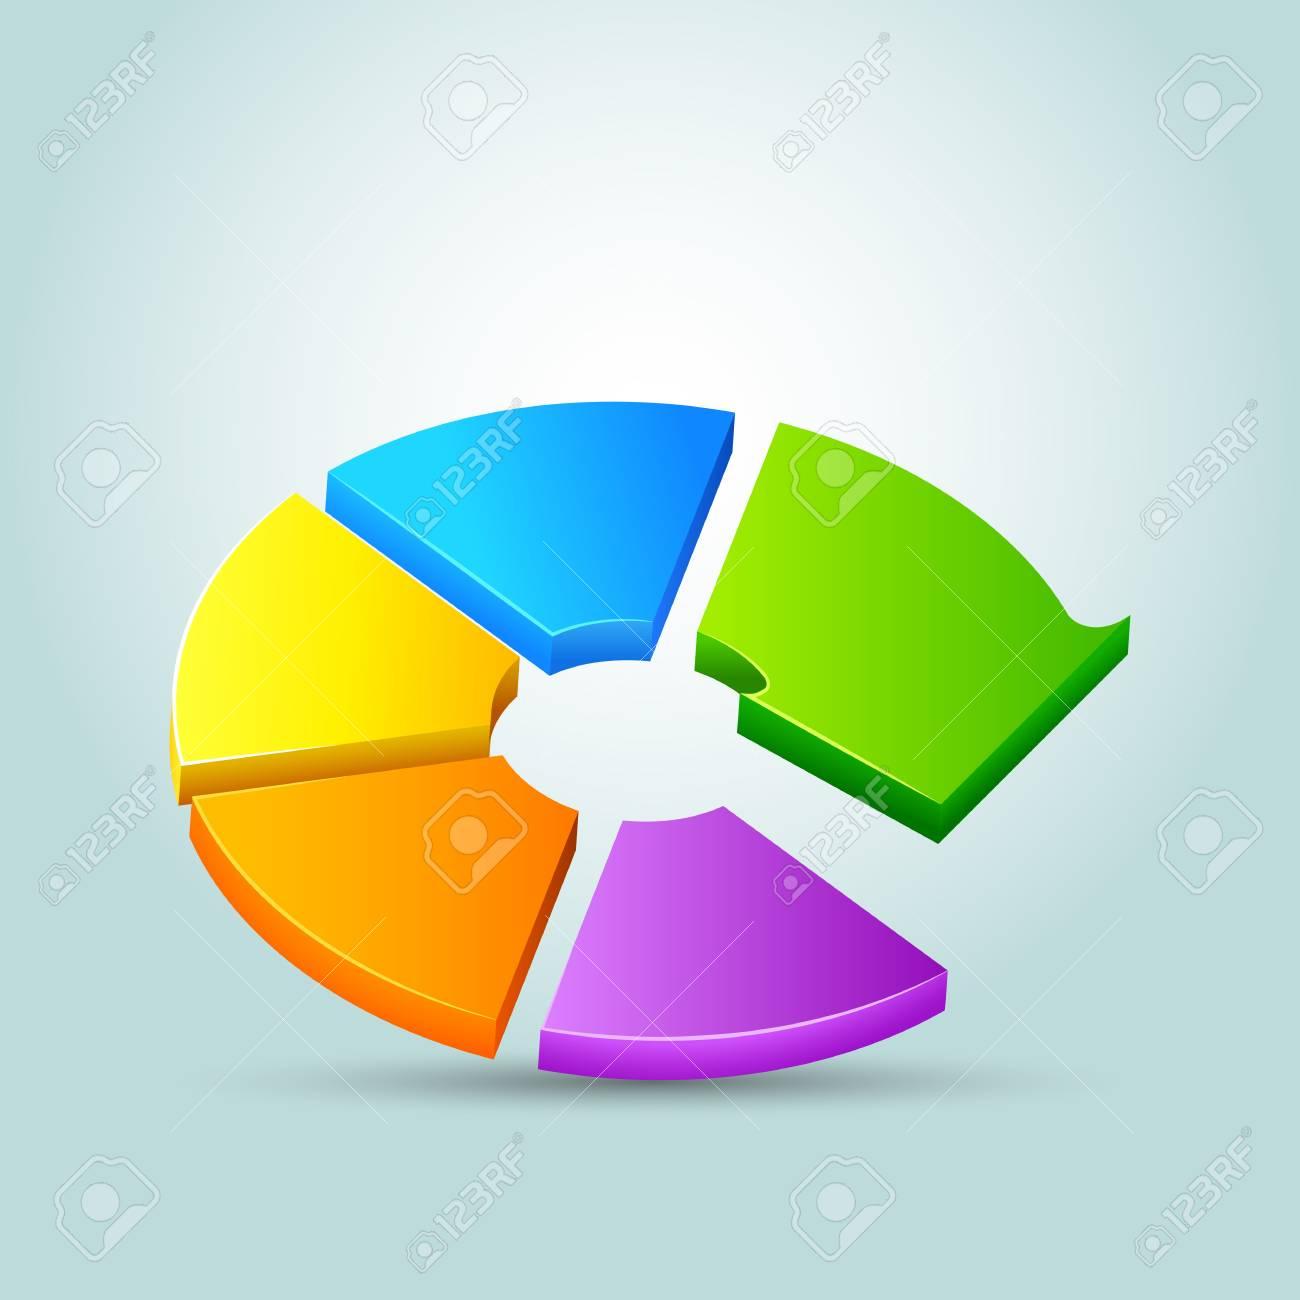 vector illustration of arrow shape business pie chart Stock Vector - 19504153